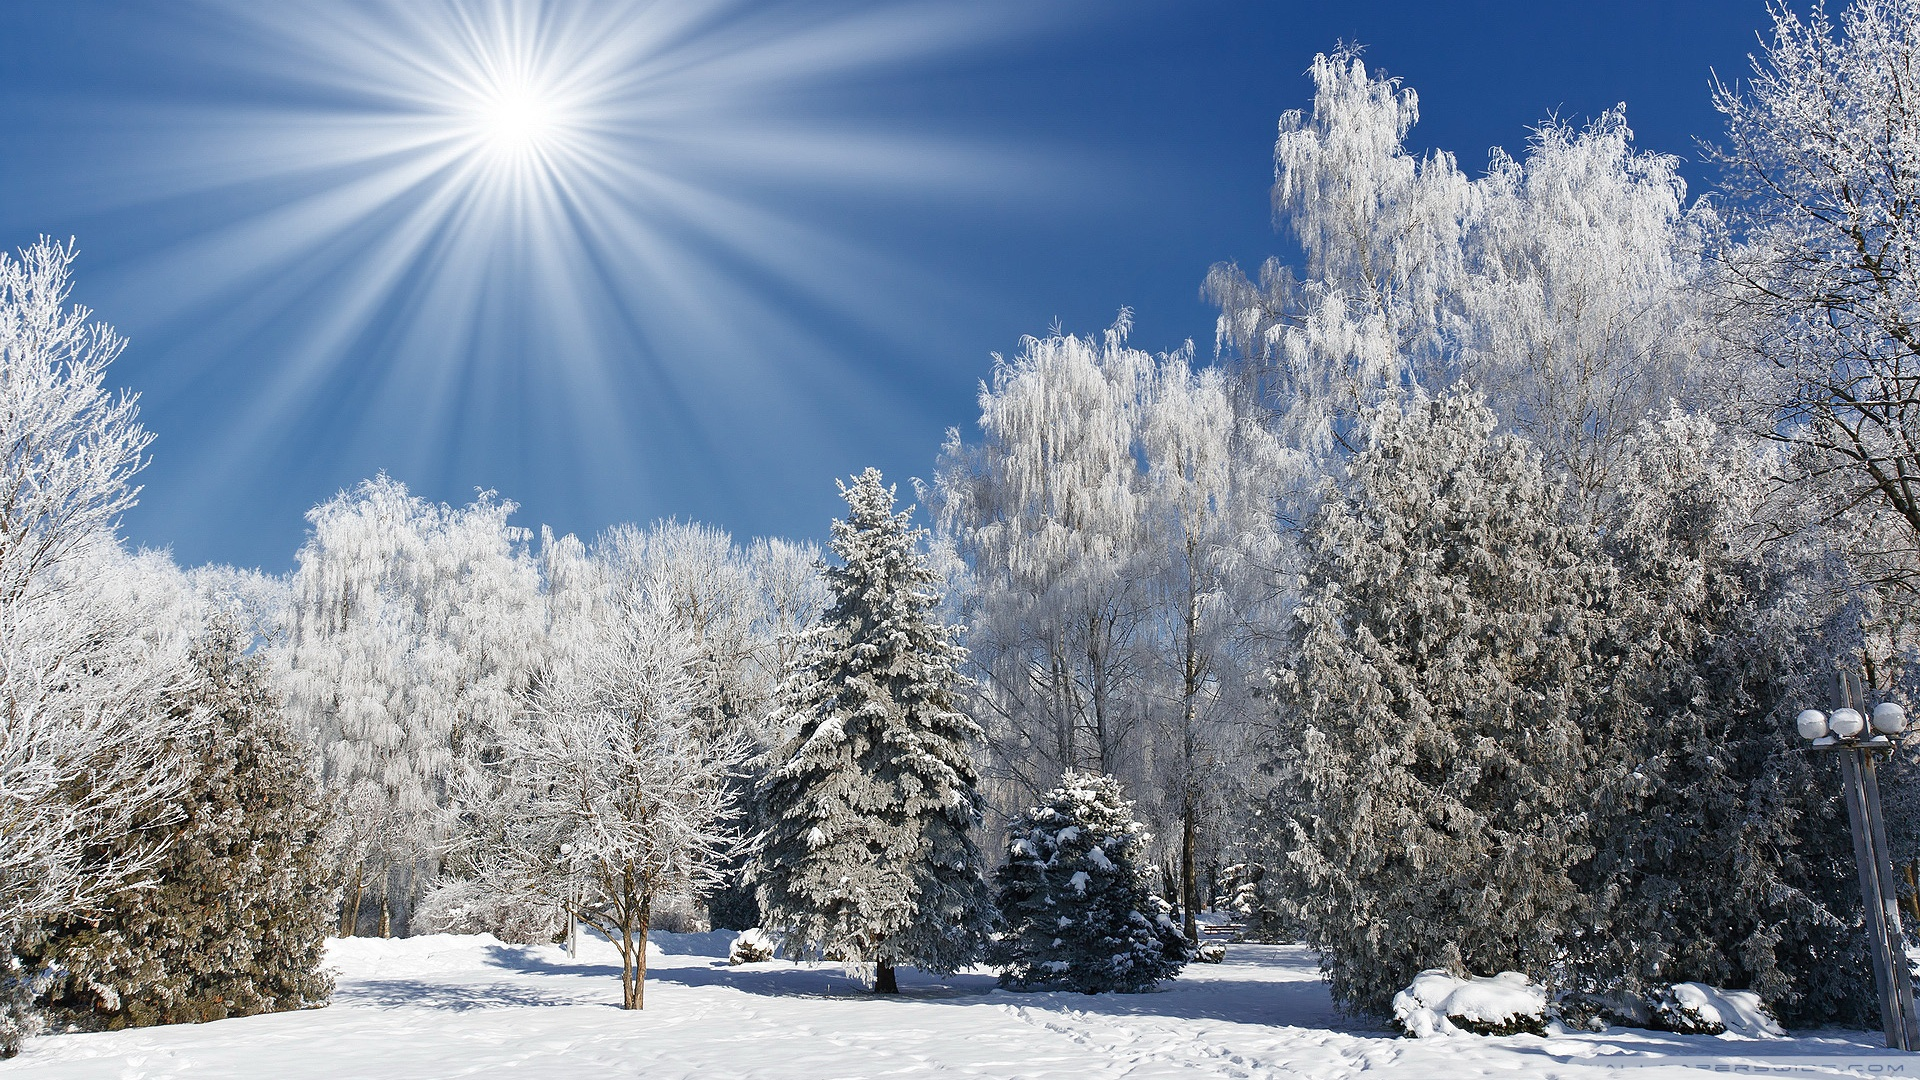 Sunny Winter Day Wallpaper - WallpaperSafari  Winter Sunny Beach